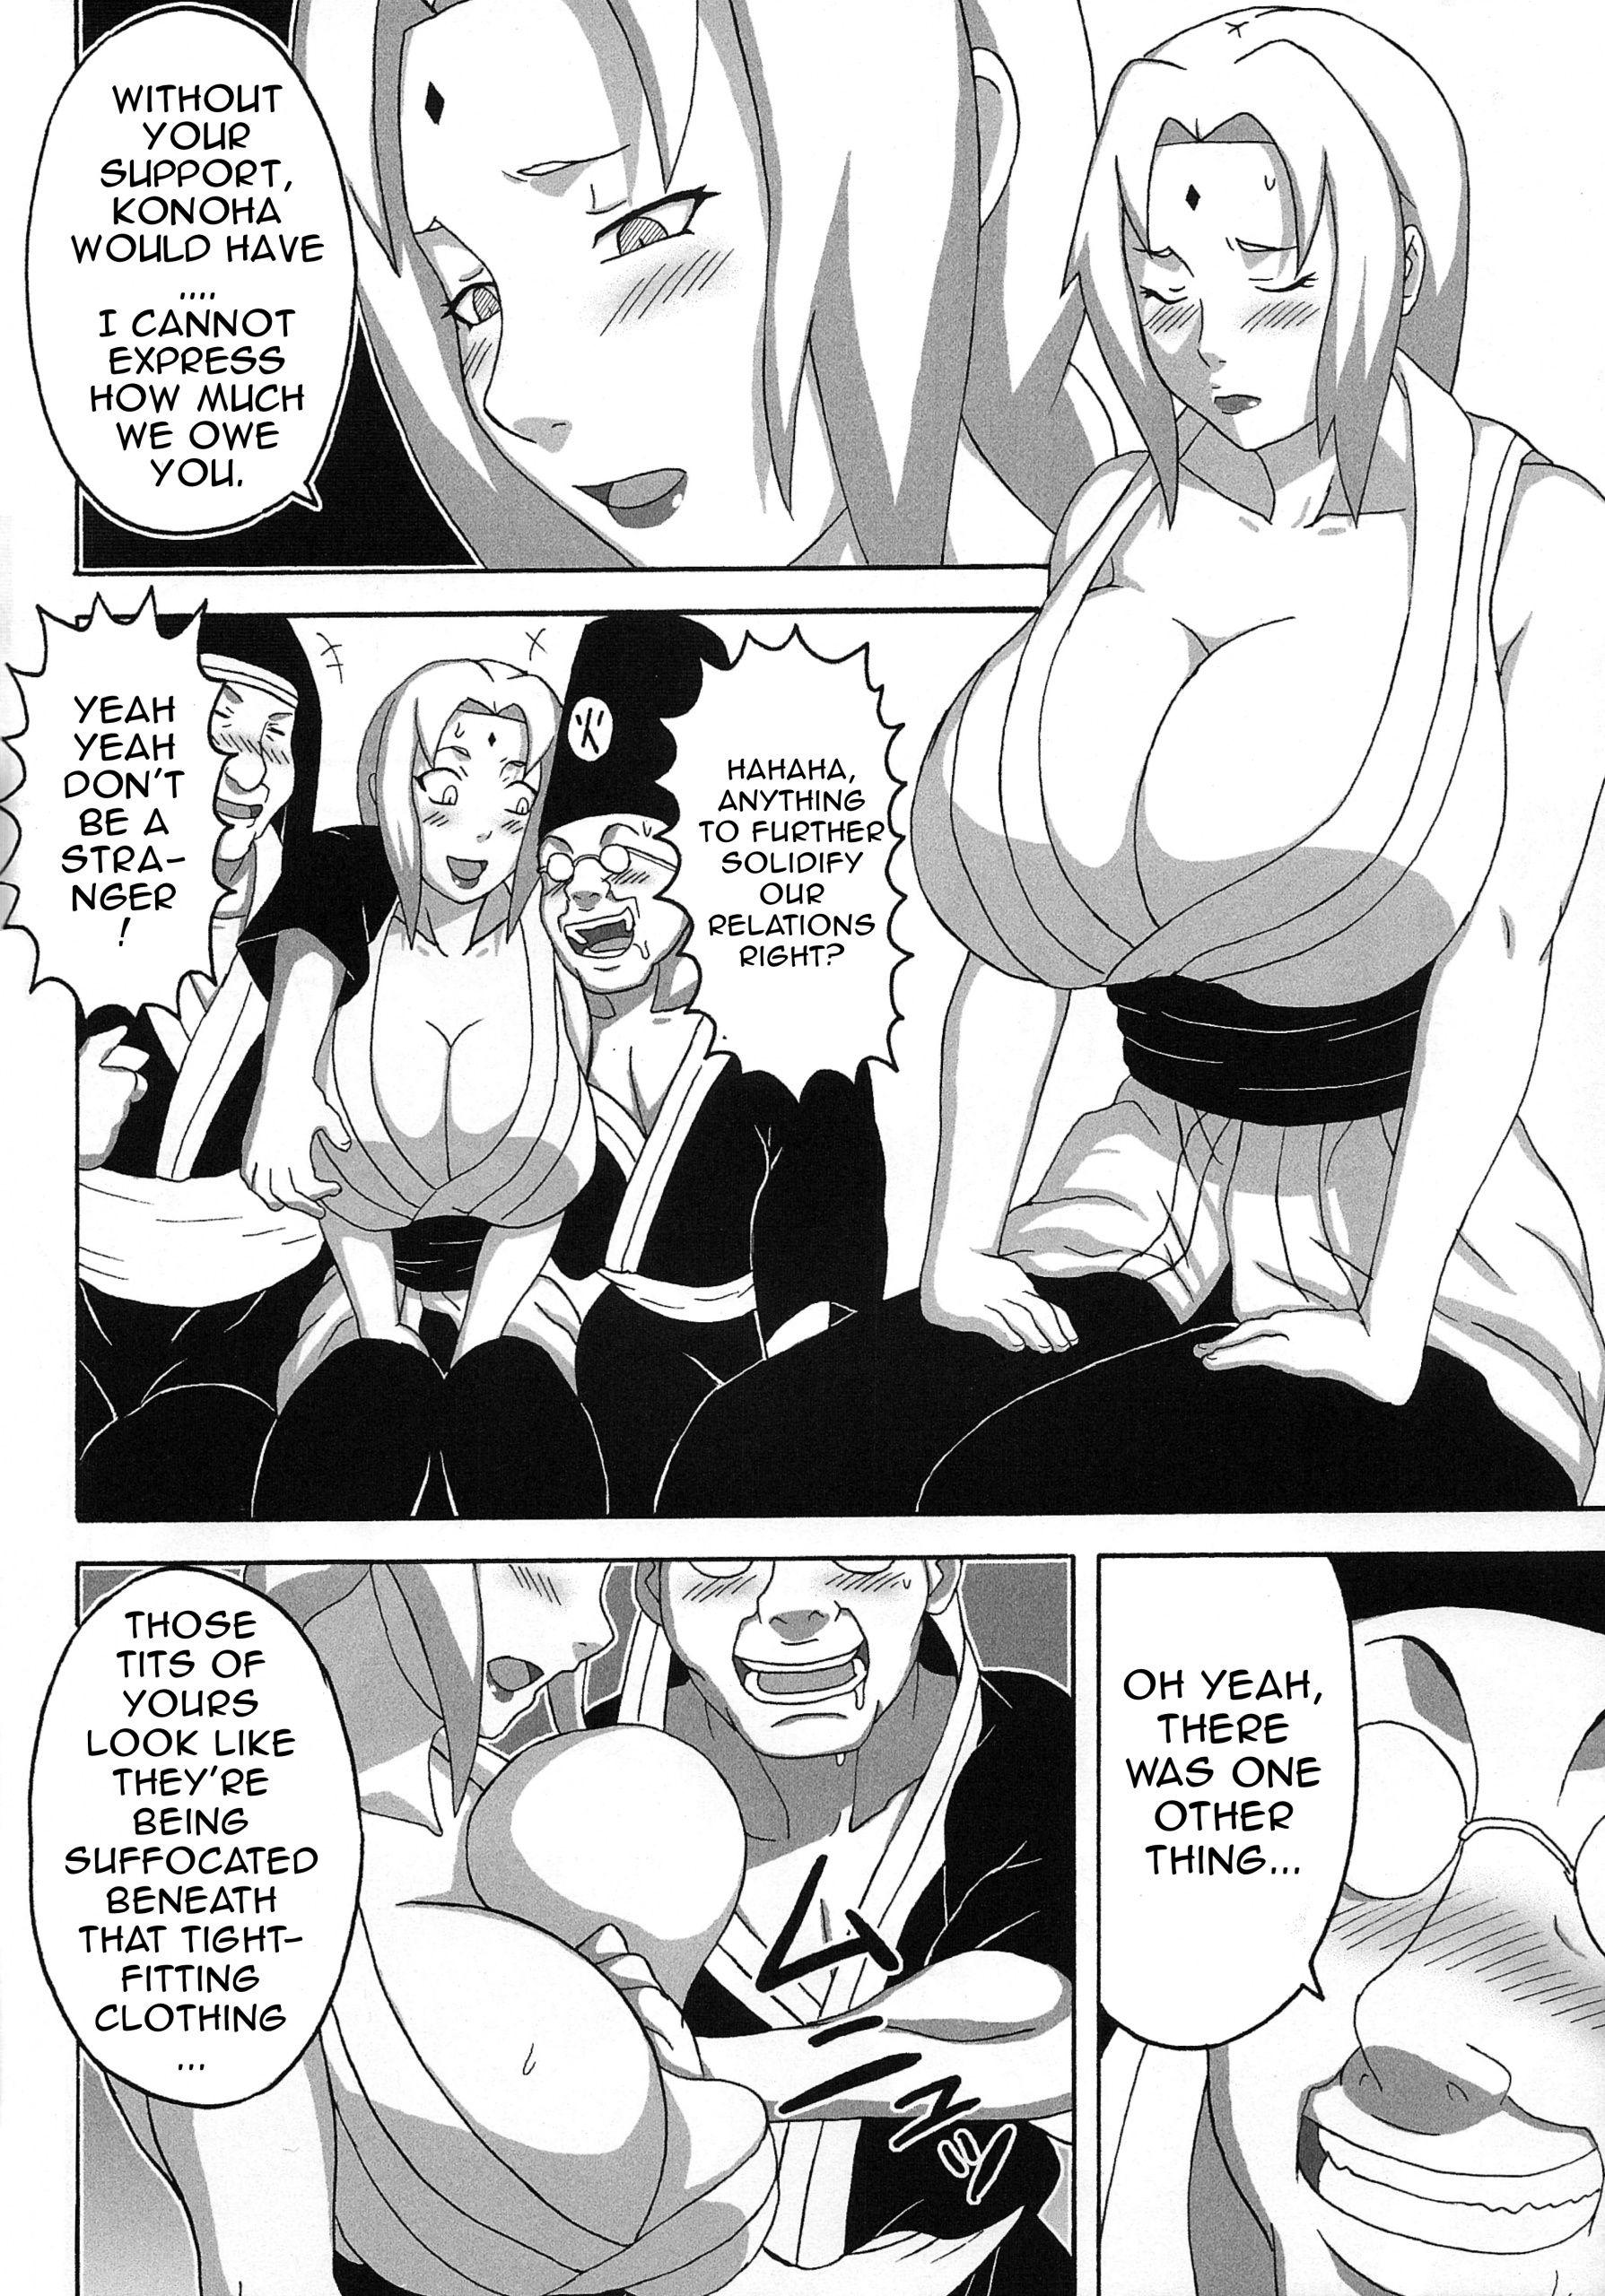 Tsunades lewd reception party hentai manga picture 3